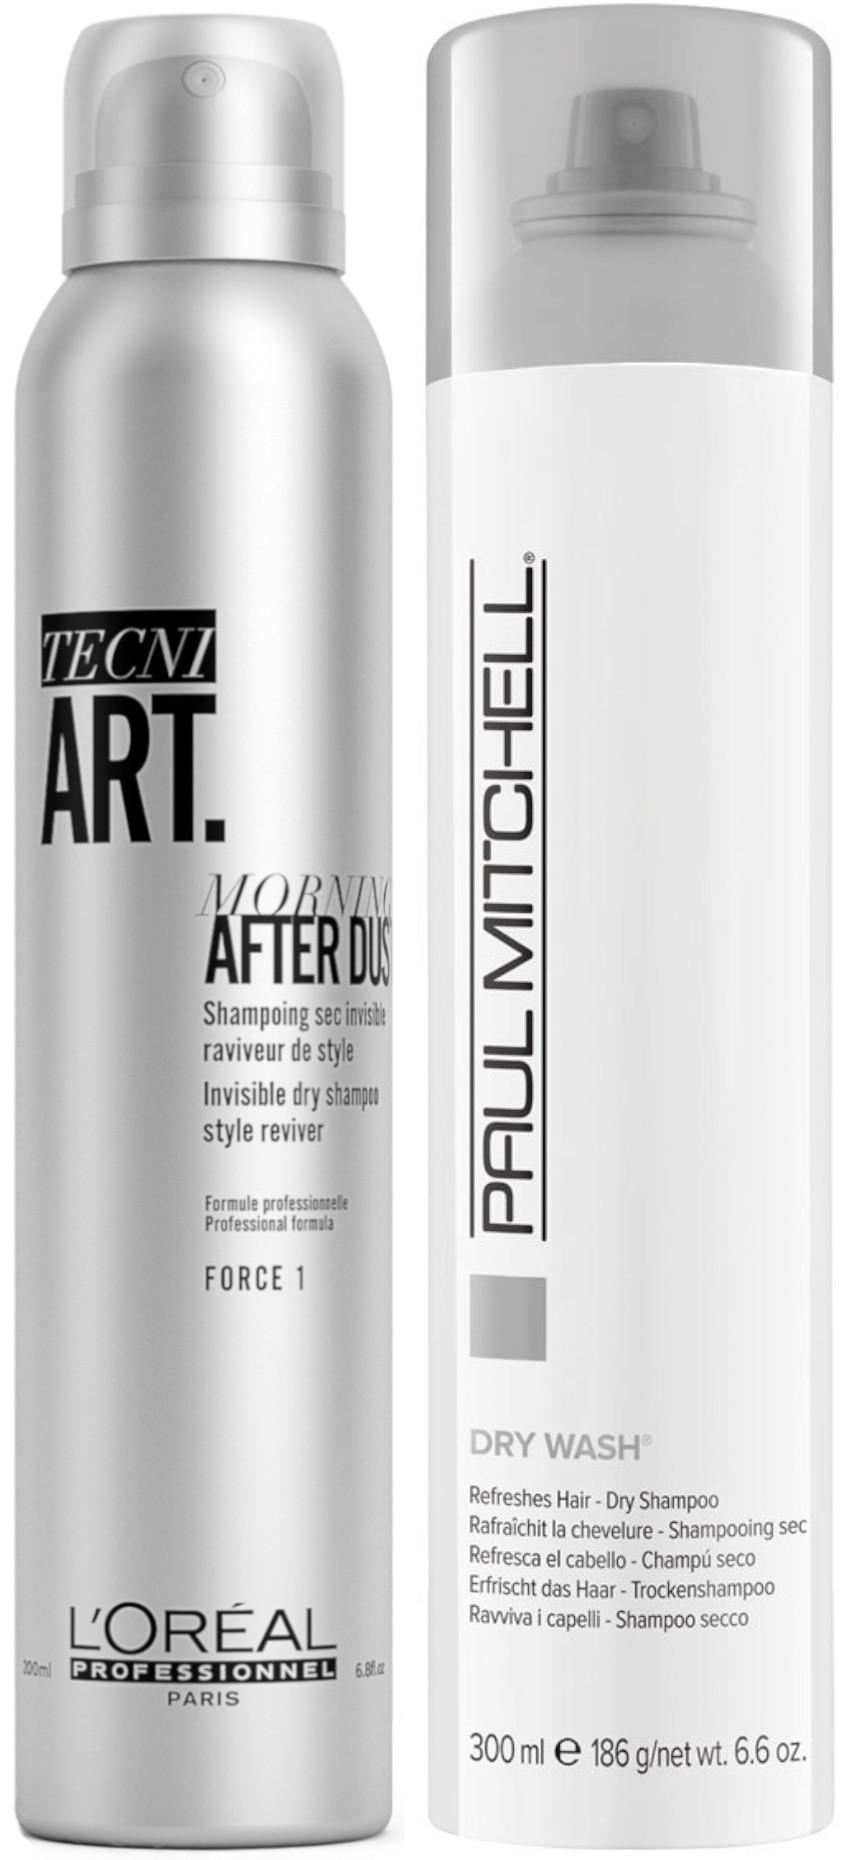 Suchý šampon pro jemné vlasy Paul Mitchell Dry Wash® - 300 ml a suchý šampon Loréal Tecni. Art Morning After Dust - 200 ml